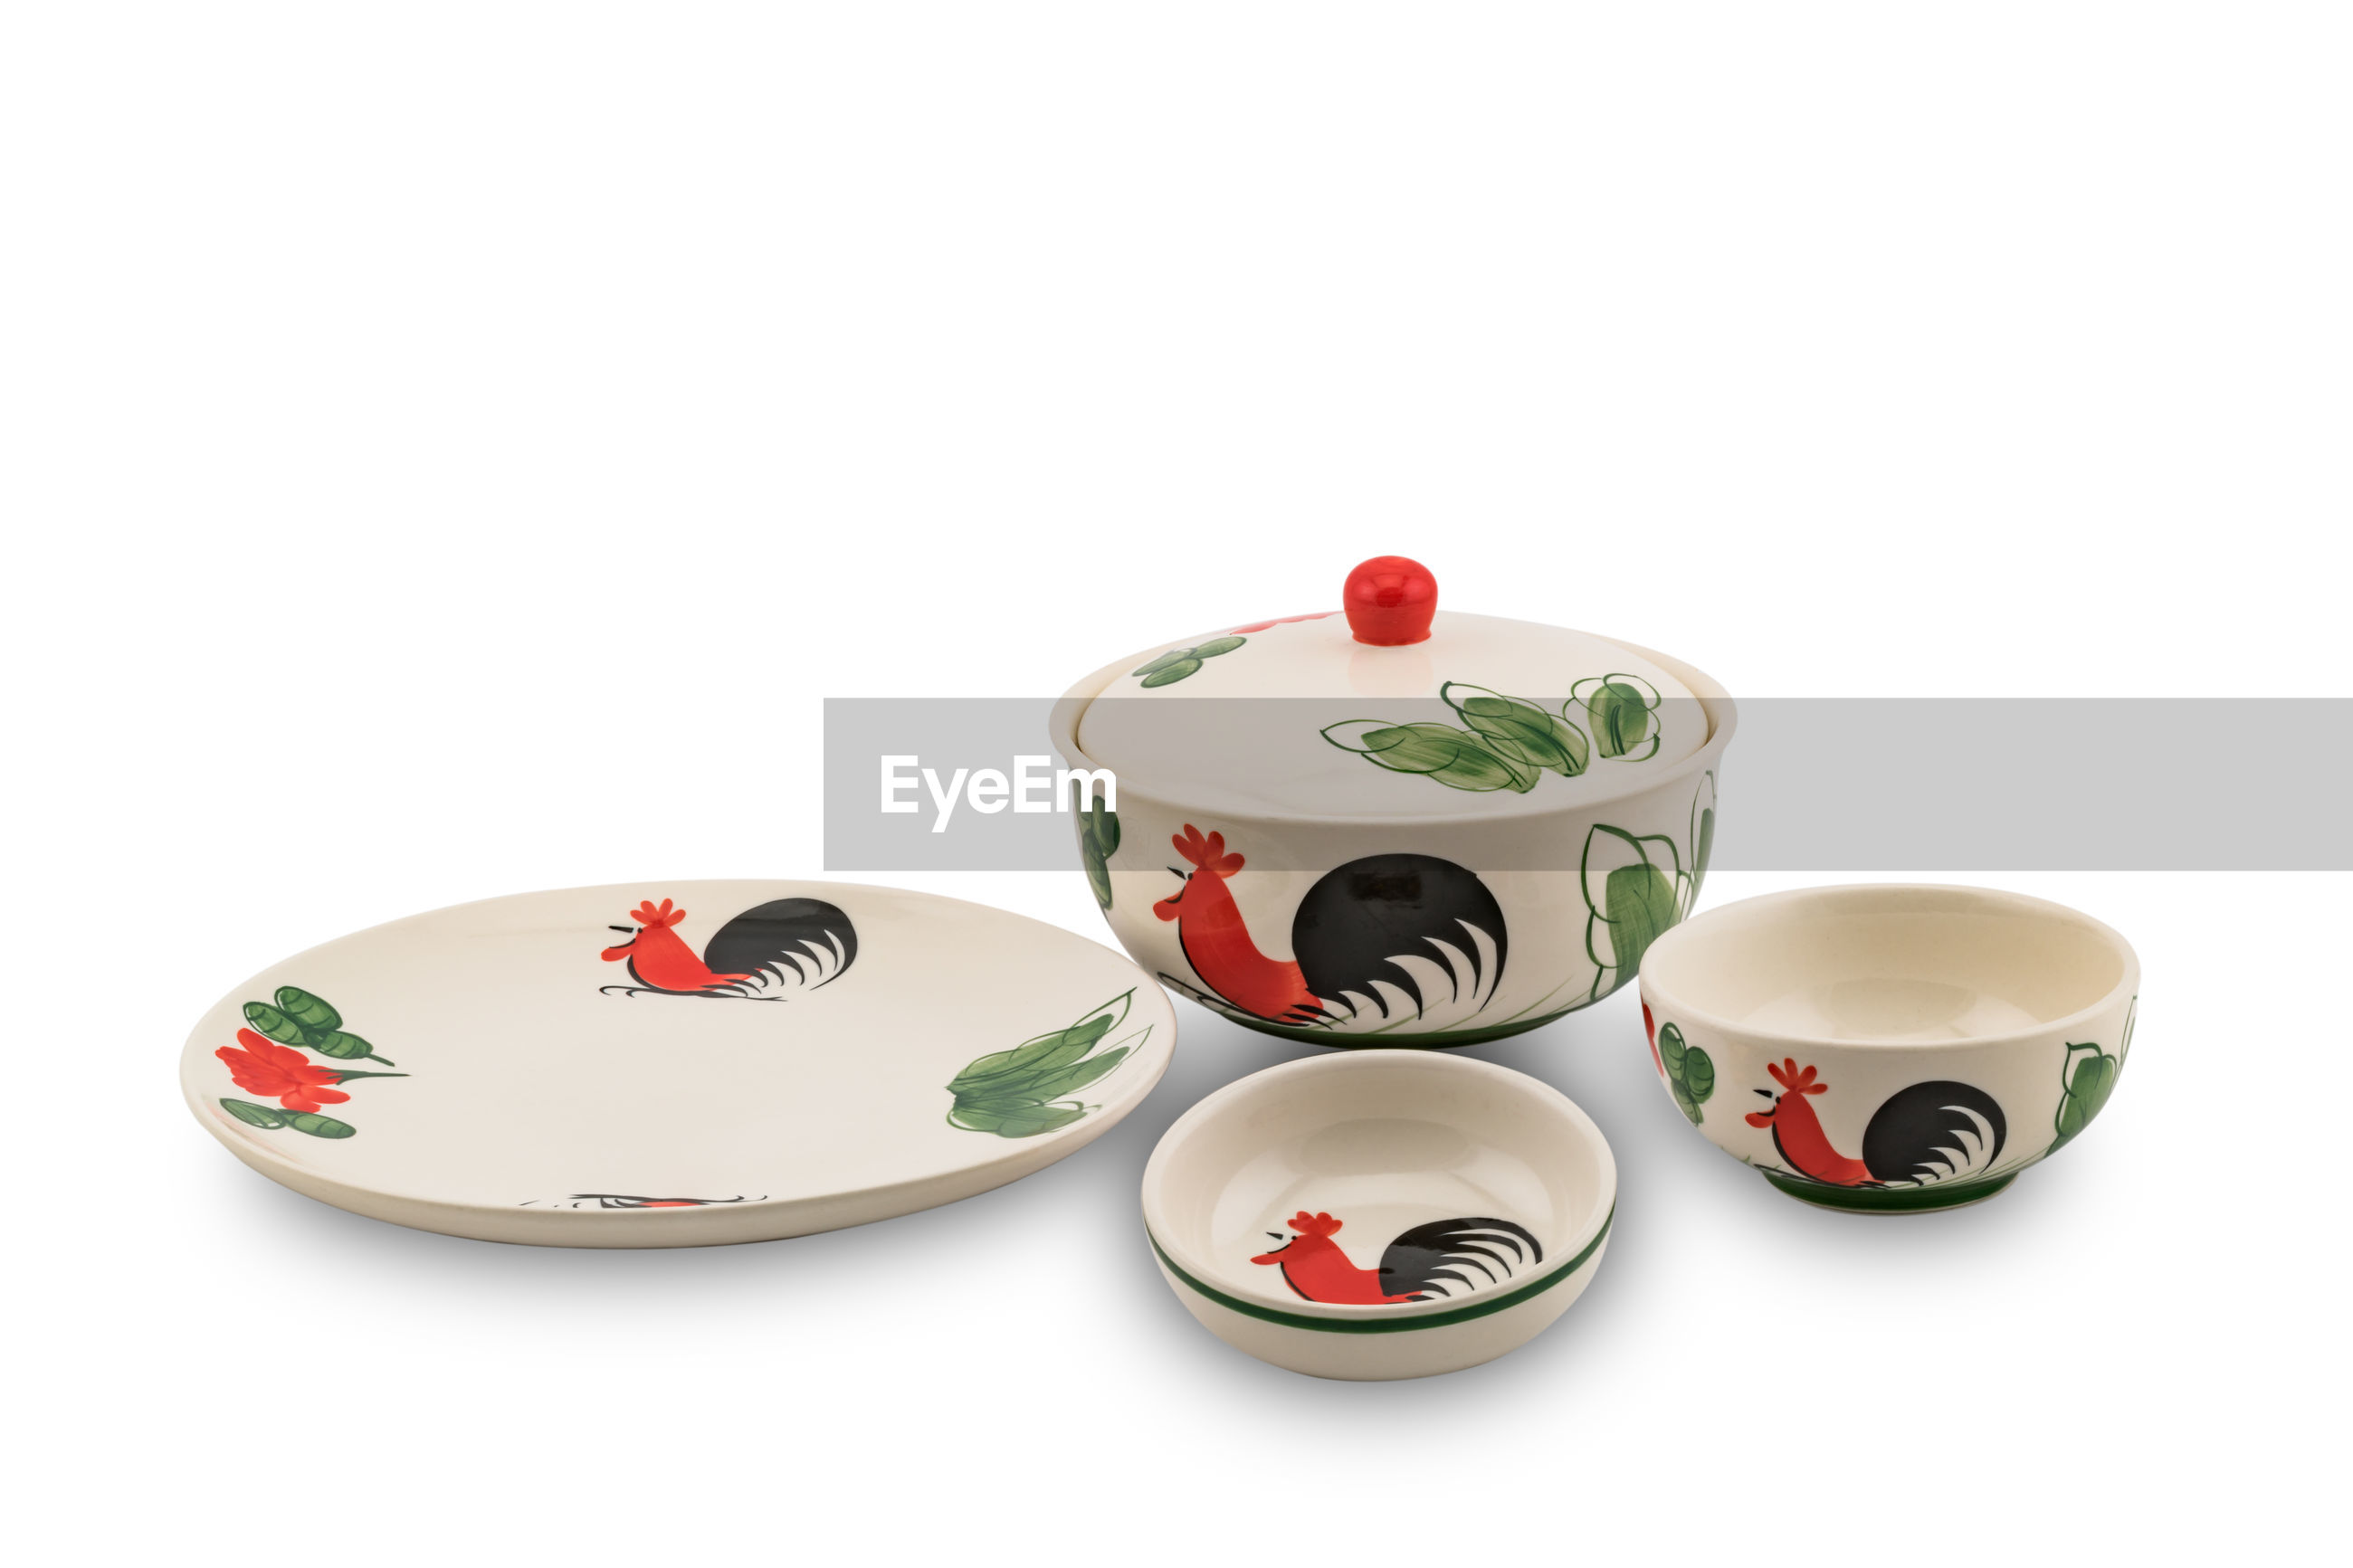 Kitchen utensils against white background